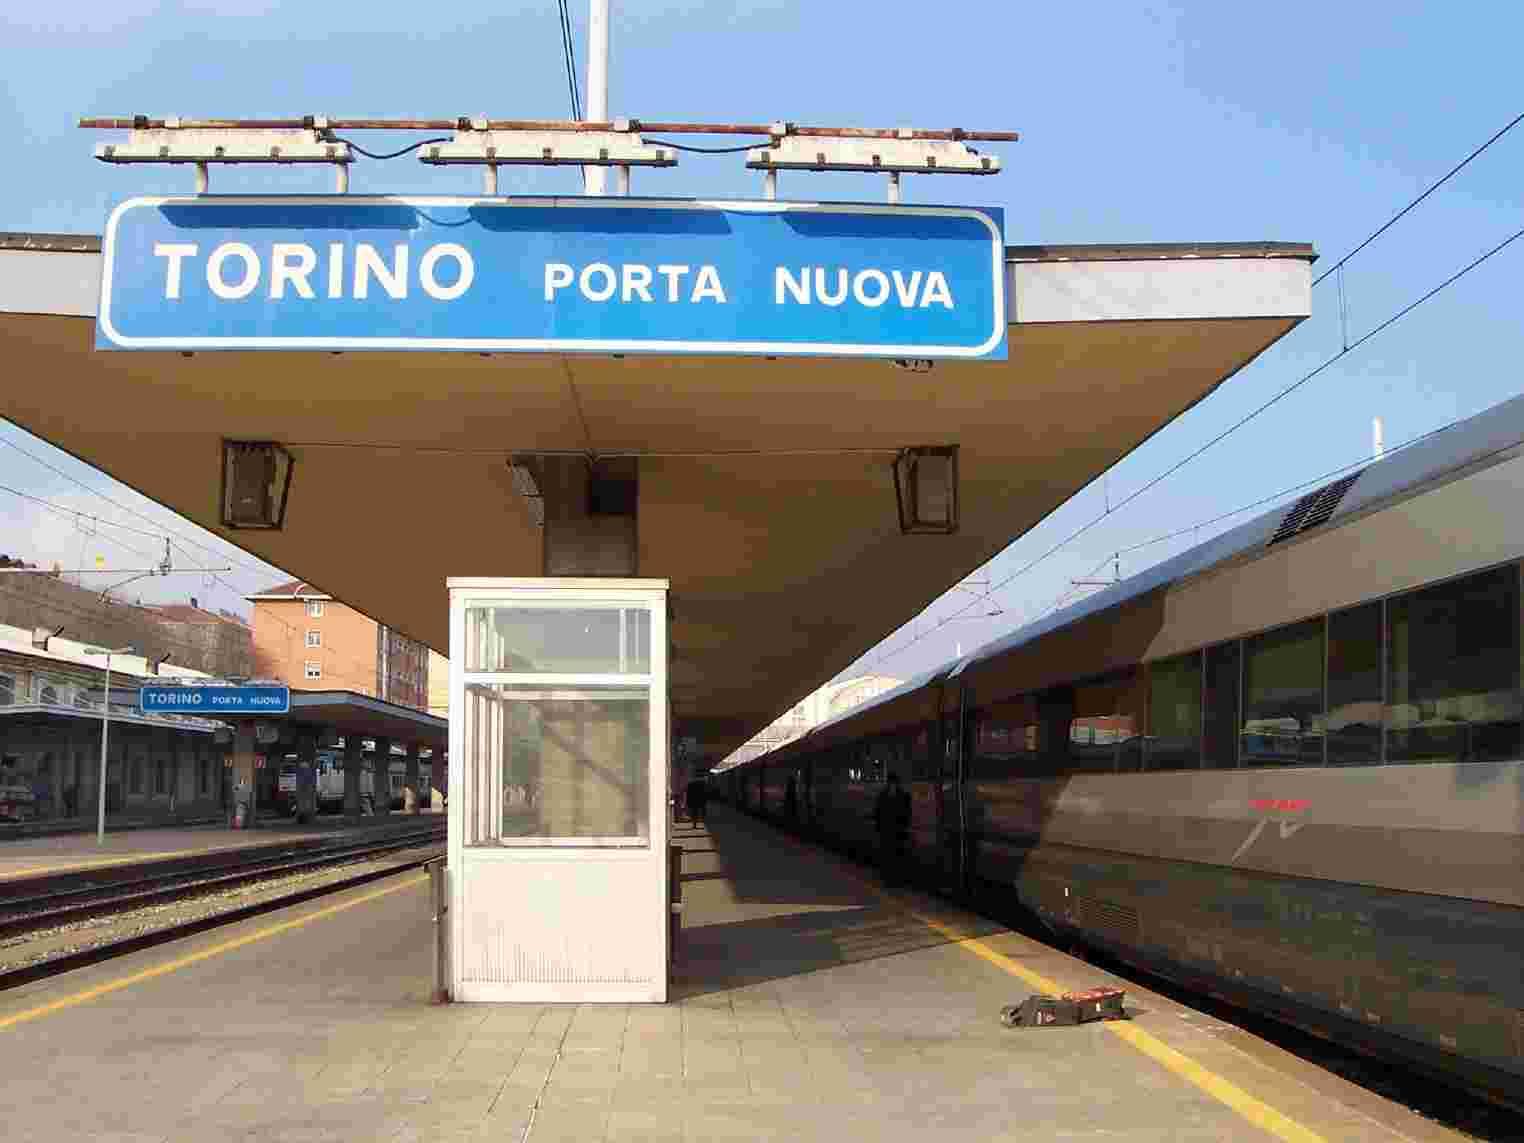 Foto alta velocita torino novara - Orari treni milano torino porta nuova ...